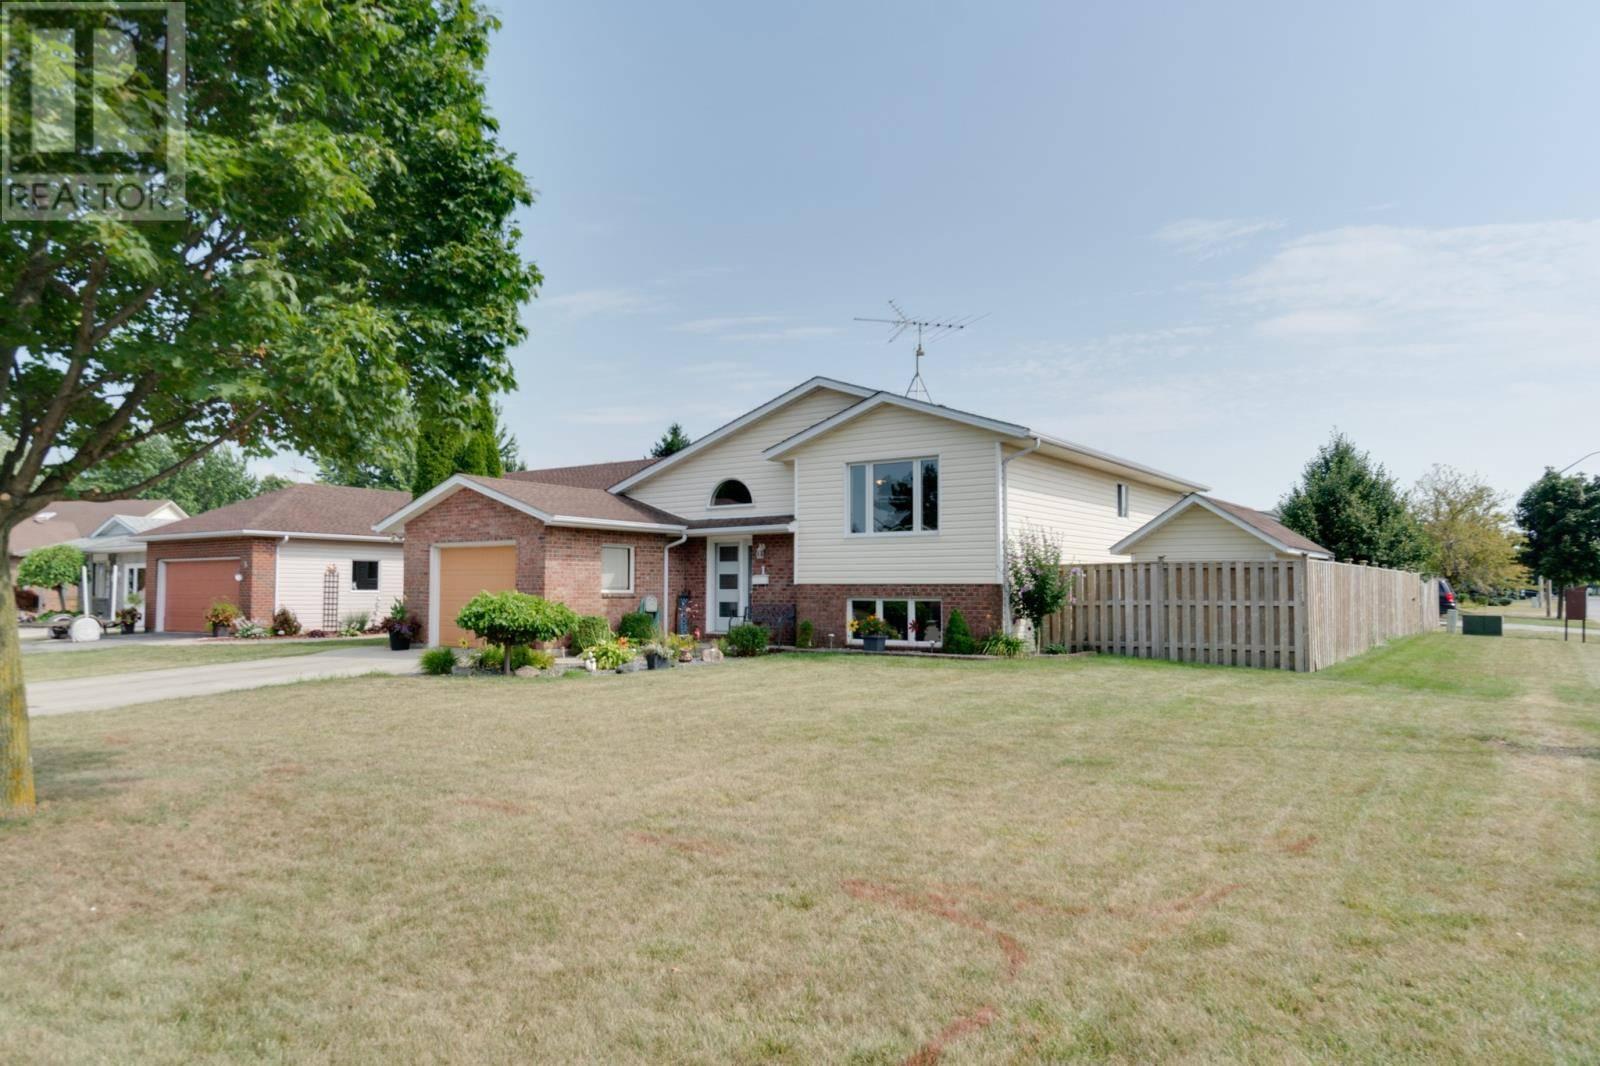 House for sale at 1 Eggleton  Amherstburg Ontario - MLS: 19023517